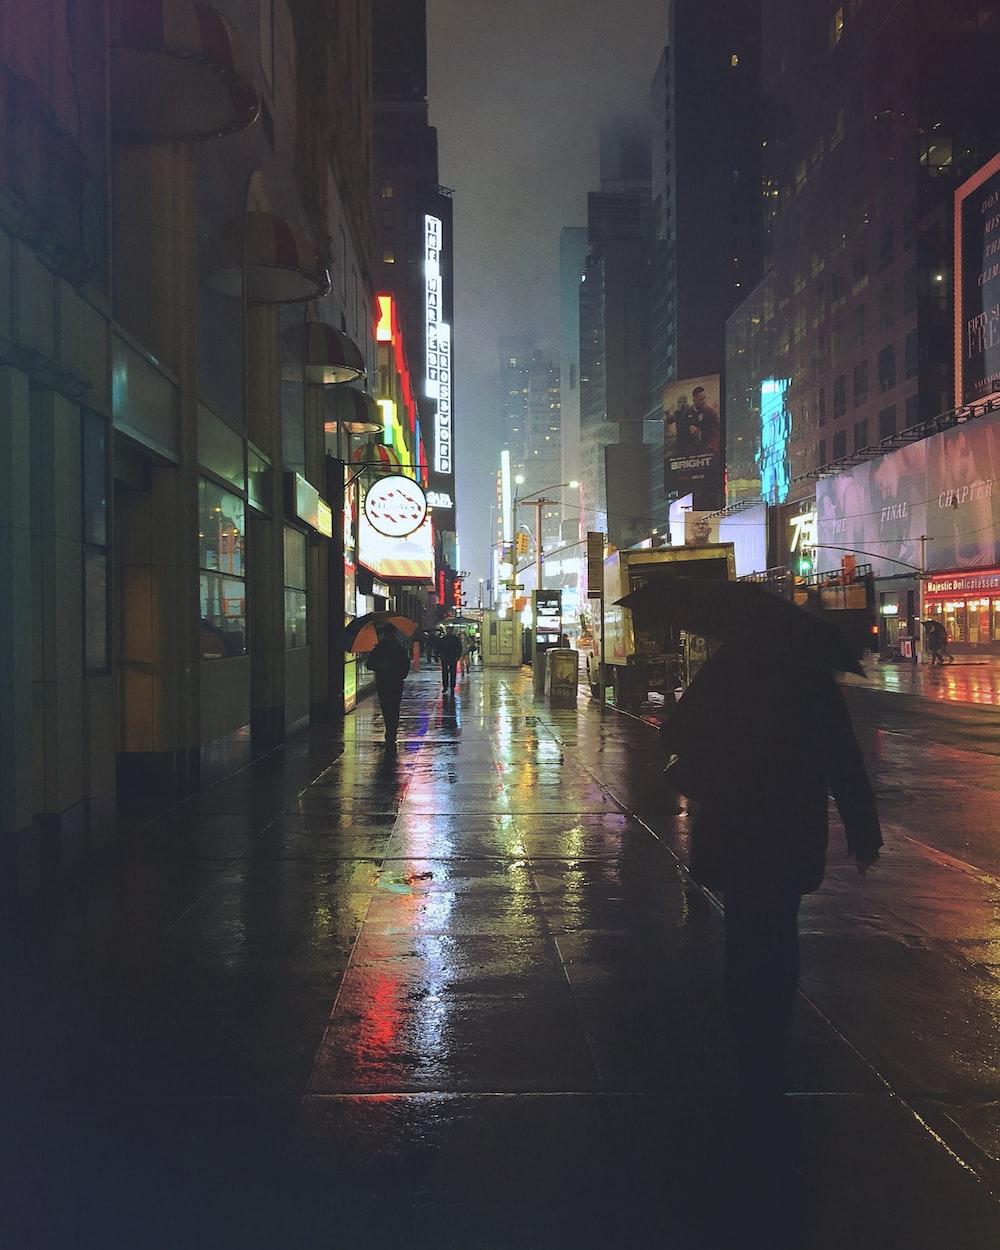 people walking on sidewalk at night